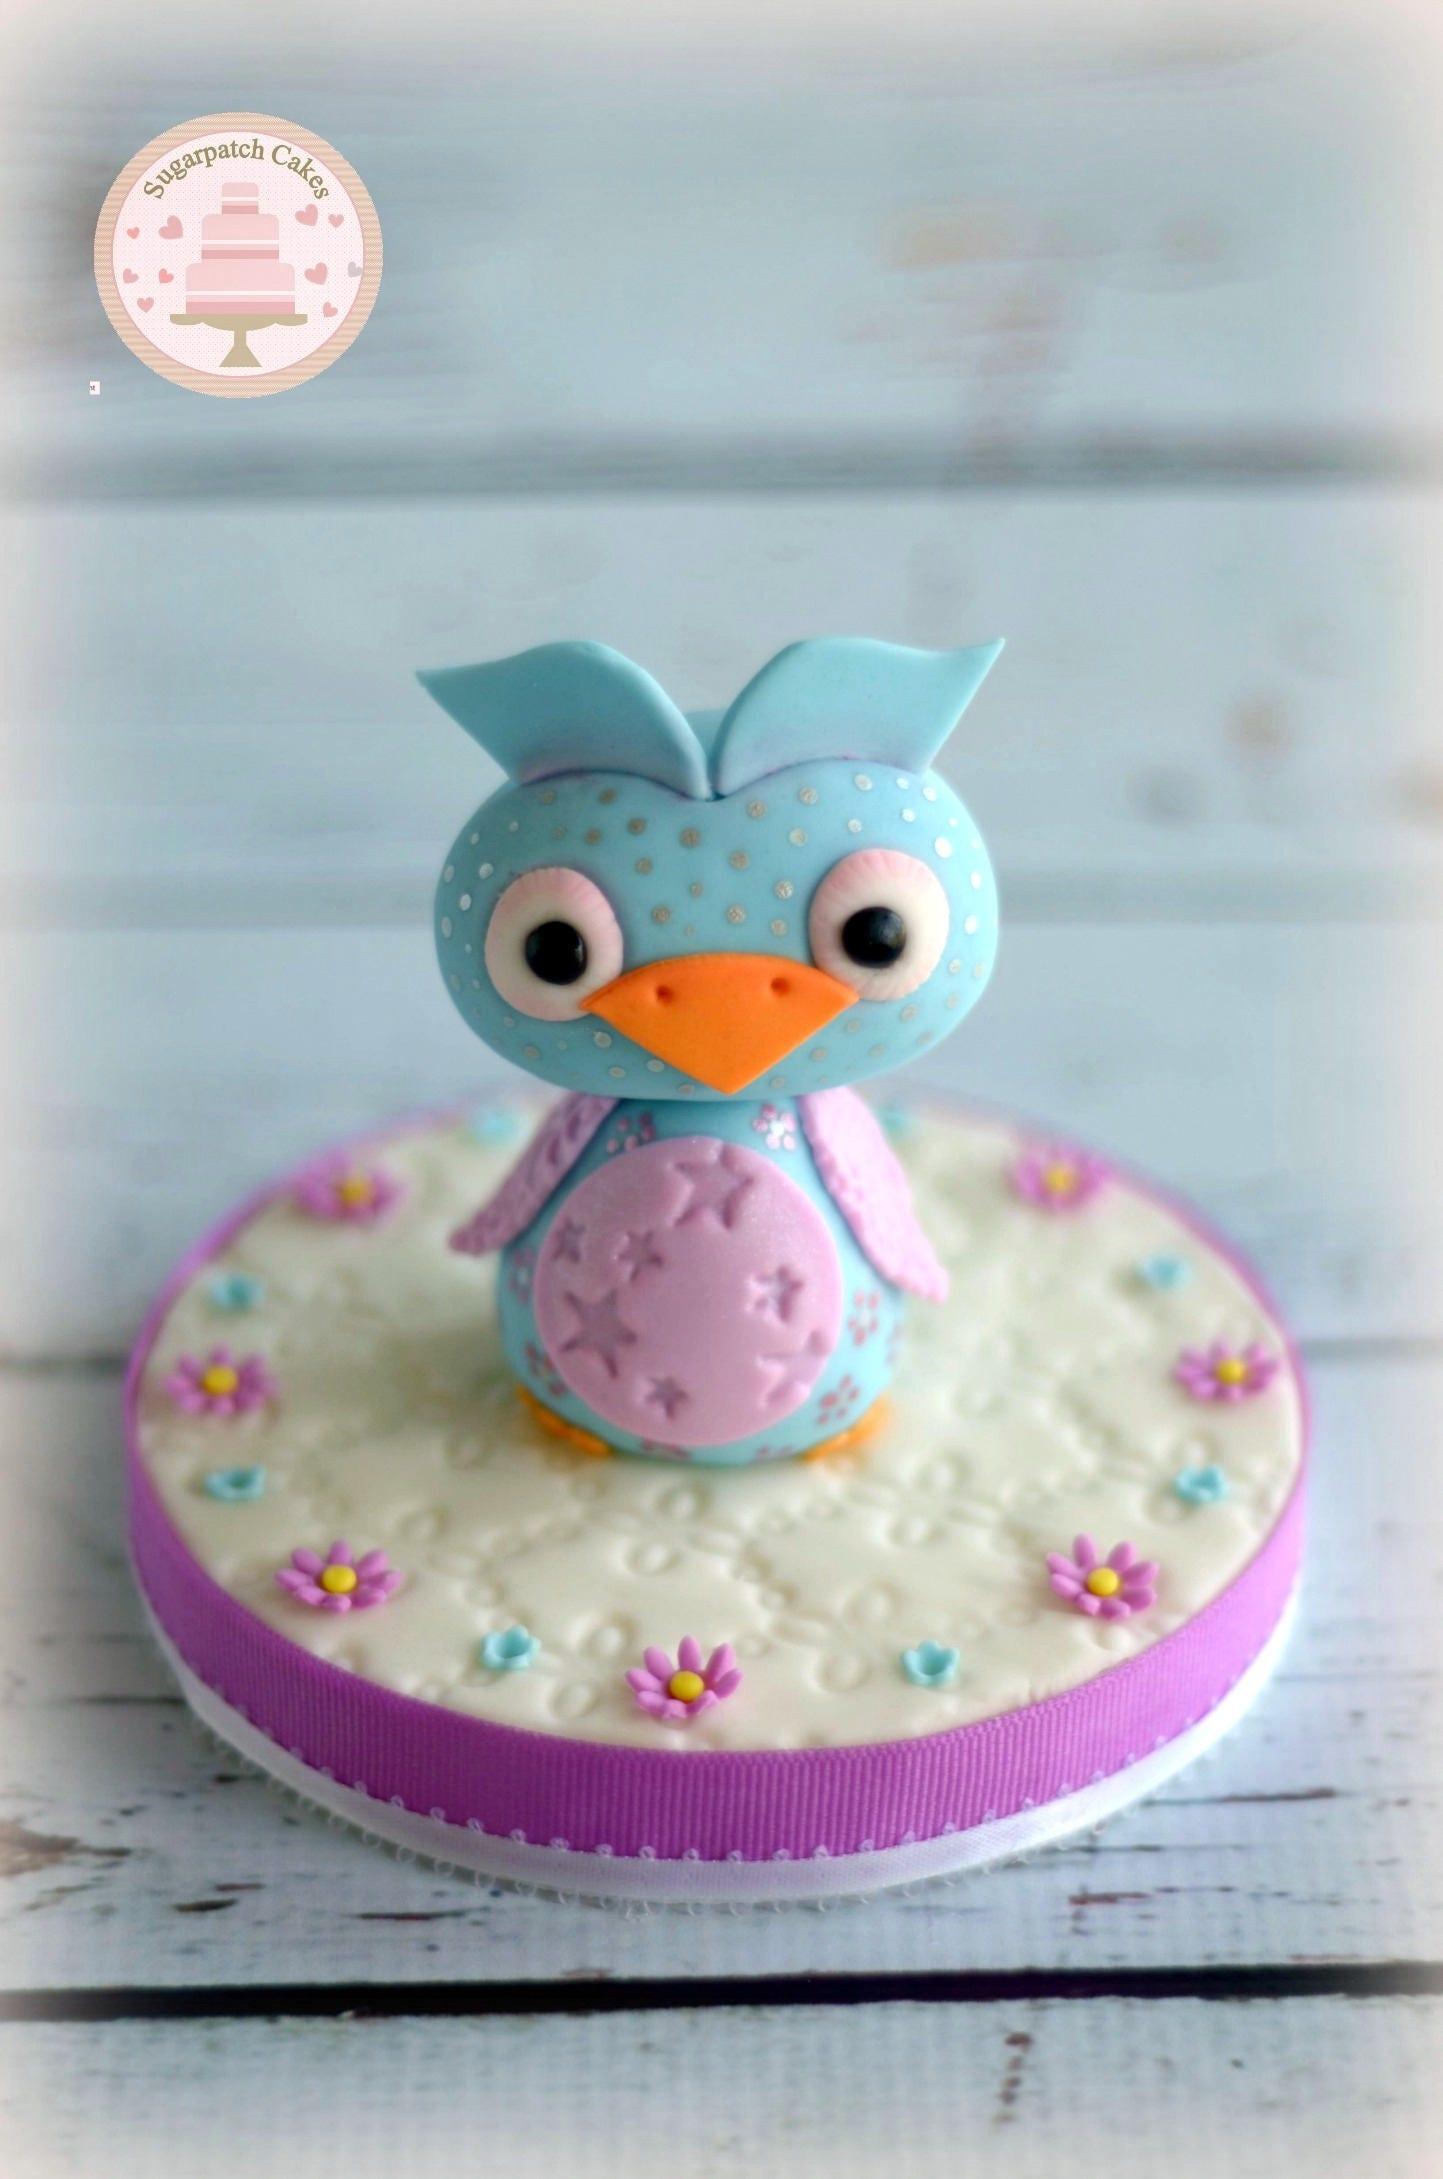 Fondant Cake Topper Owl Cake Topper Cute Cake Topper